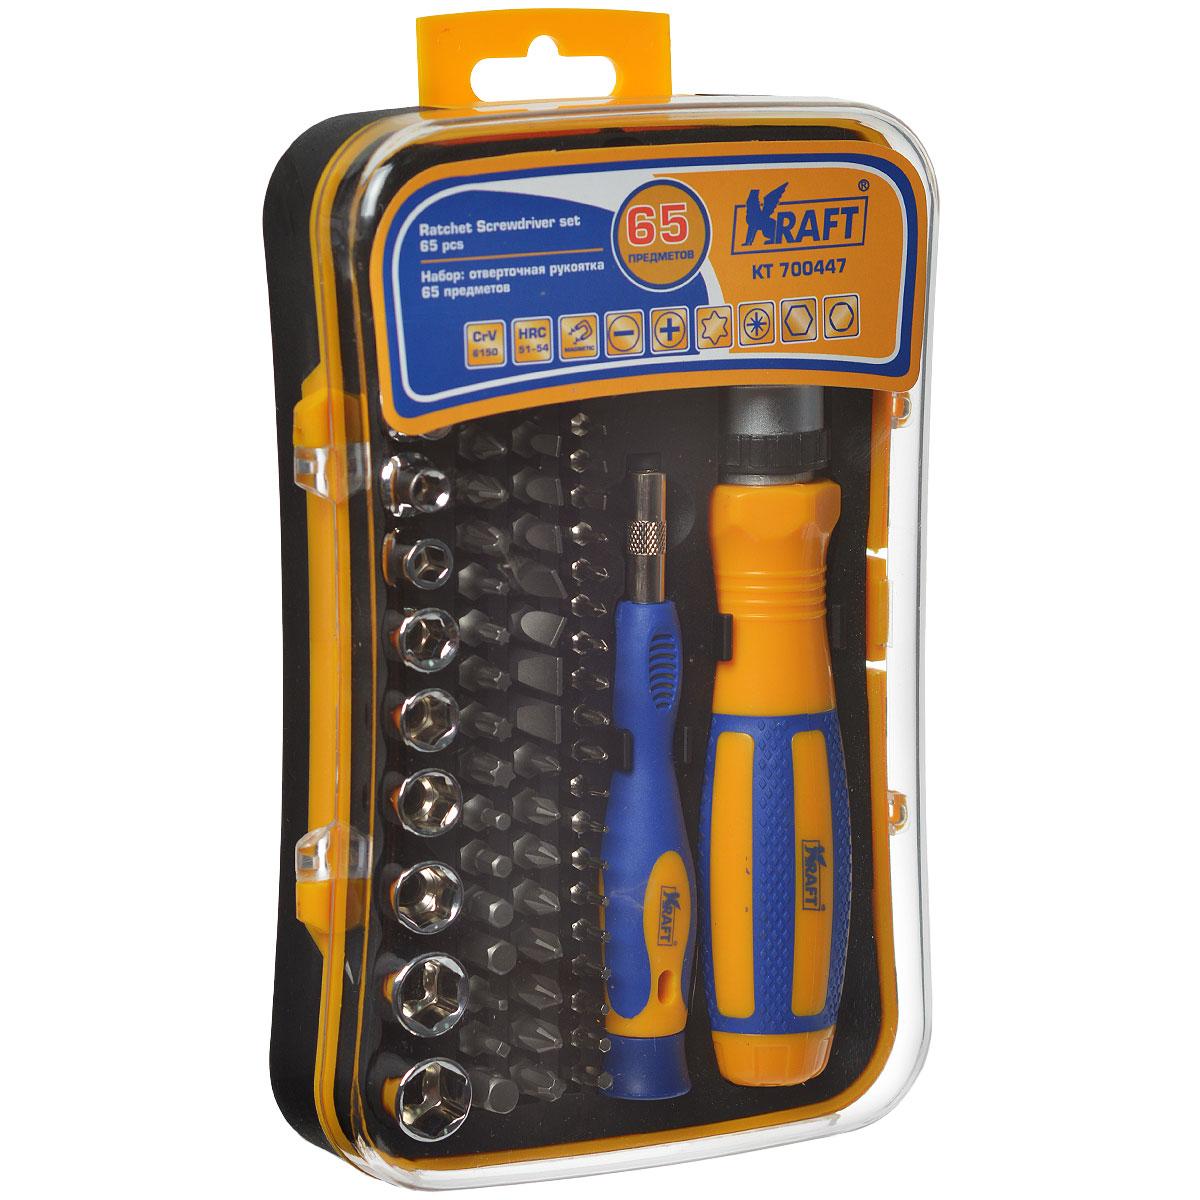 "Набор инструментов Kraft Professional"", 65 предметов"